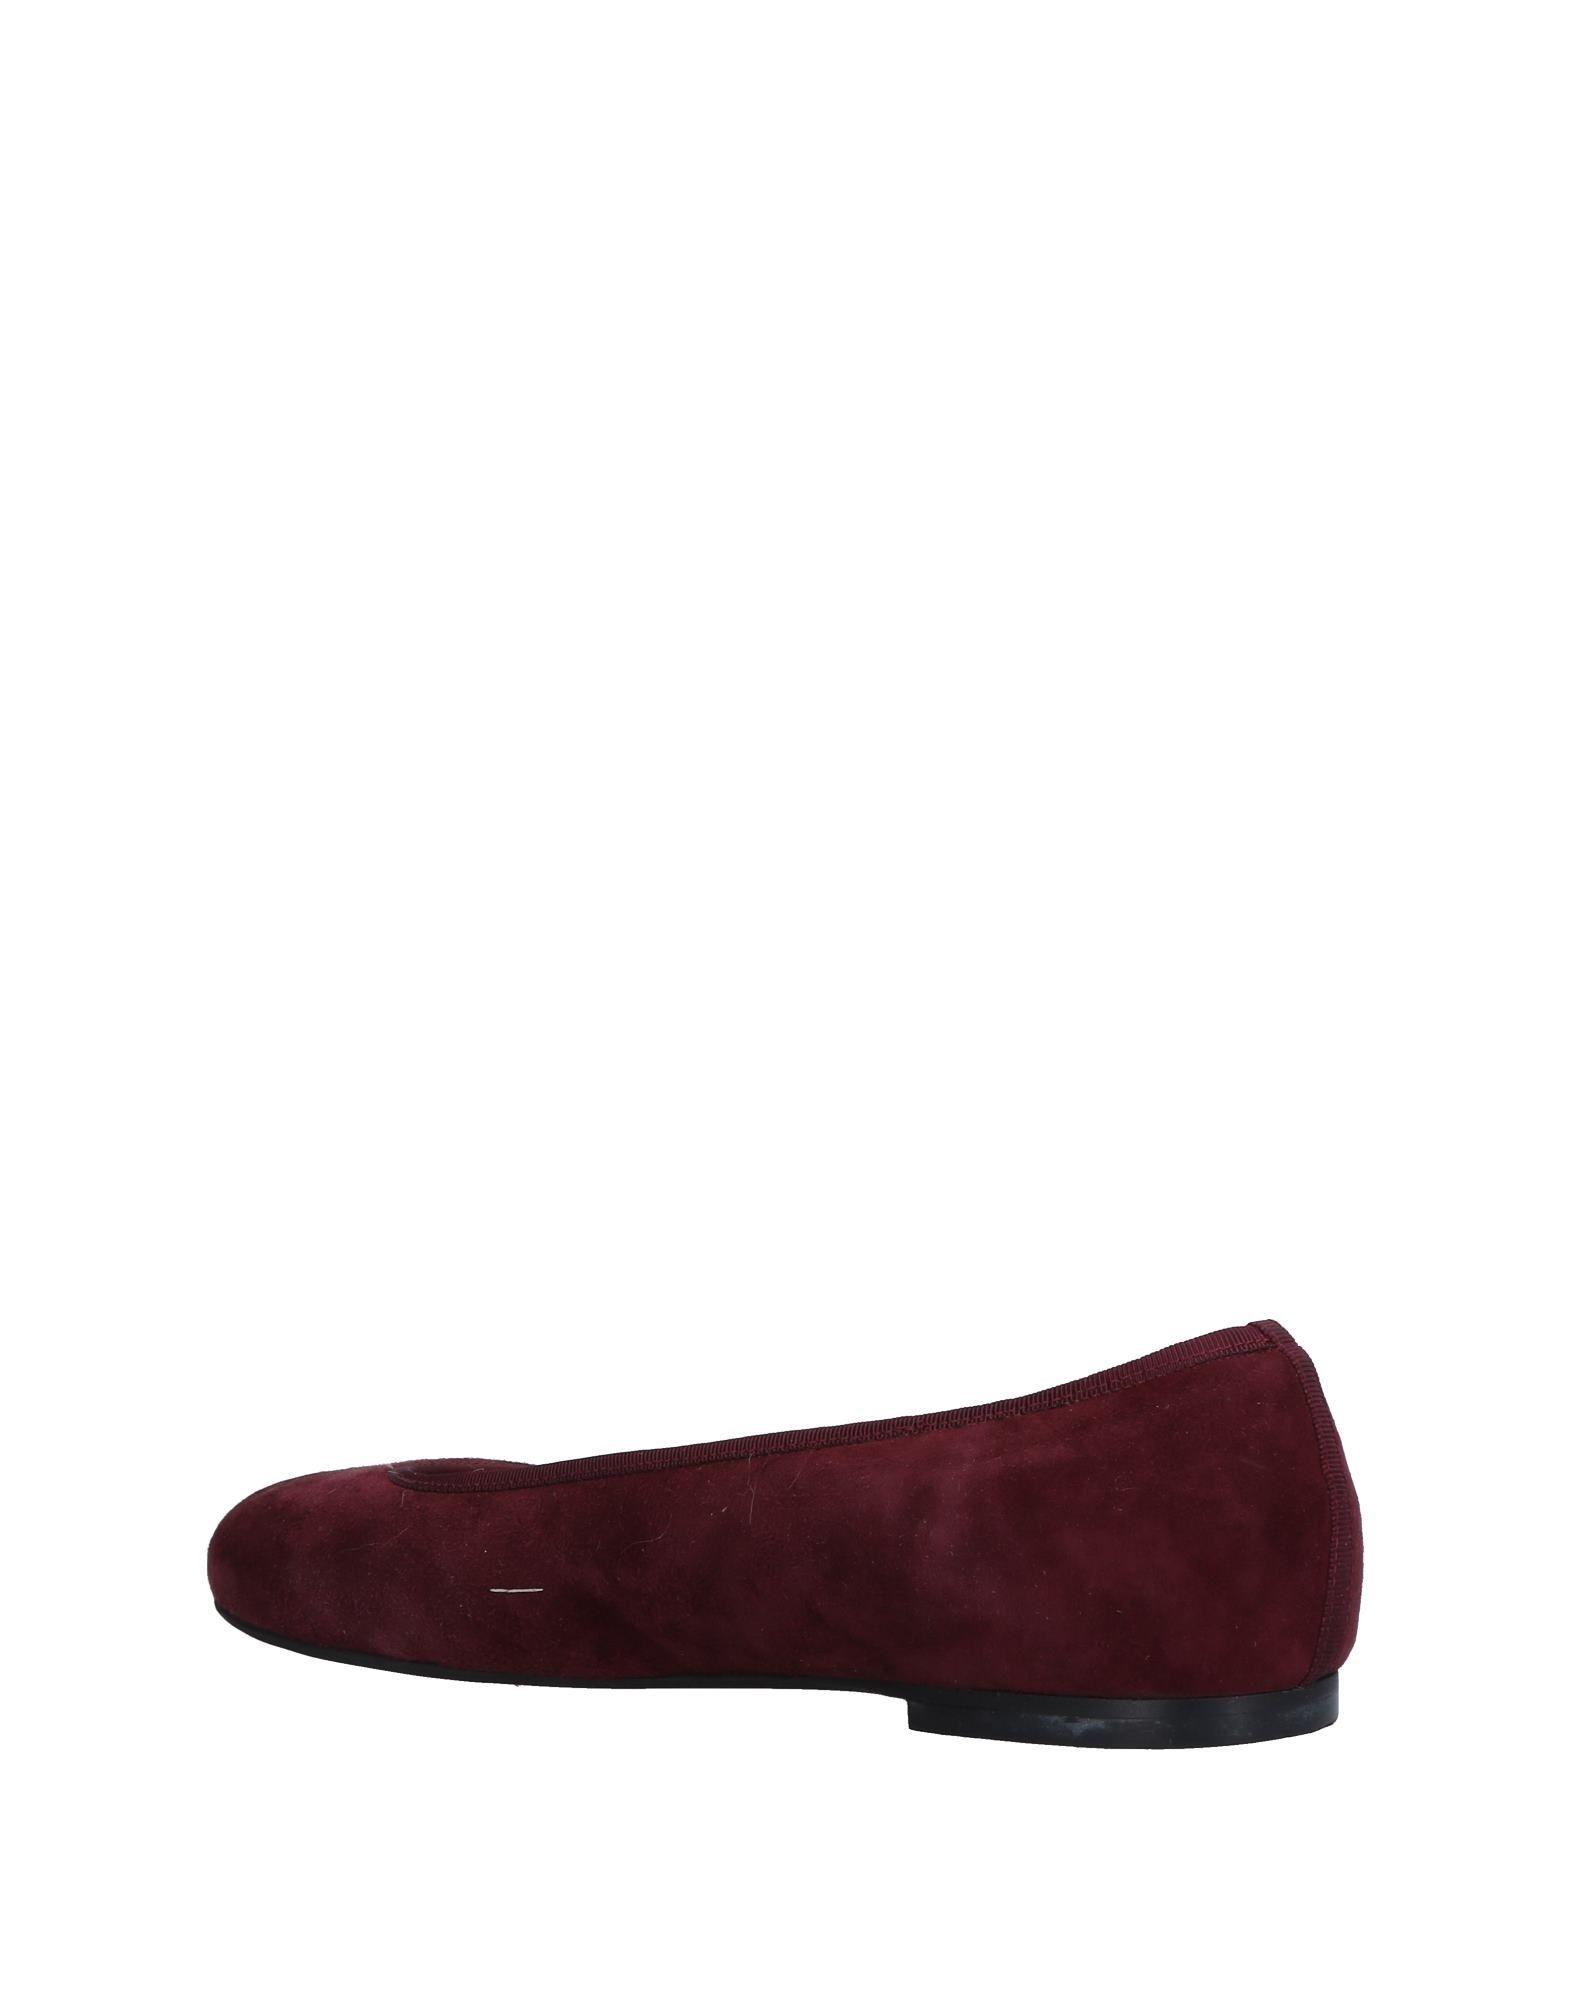 K. Spin Gute Ballerinas Damen  11504833NO Gute Spin Qualität beliebte Schuhe c66c0d